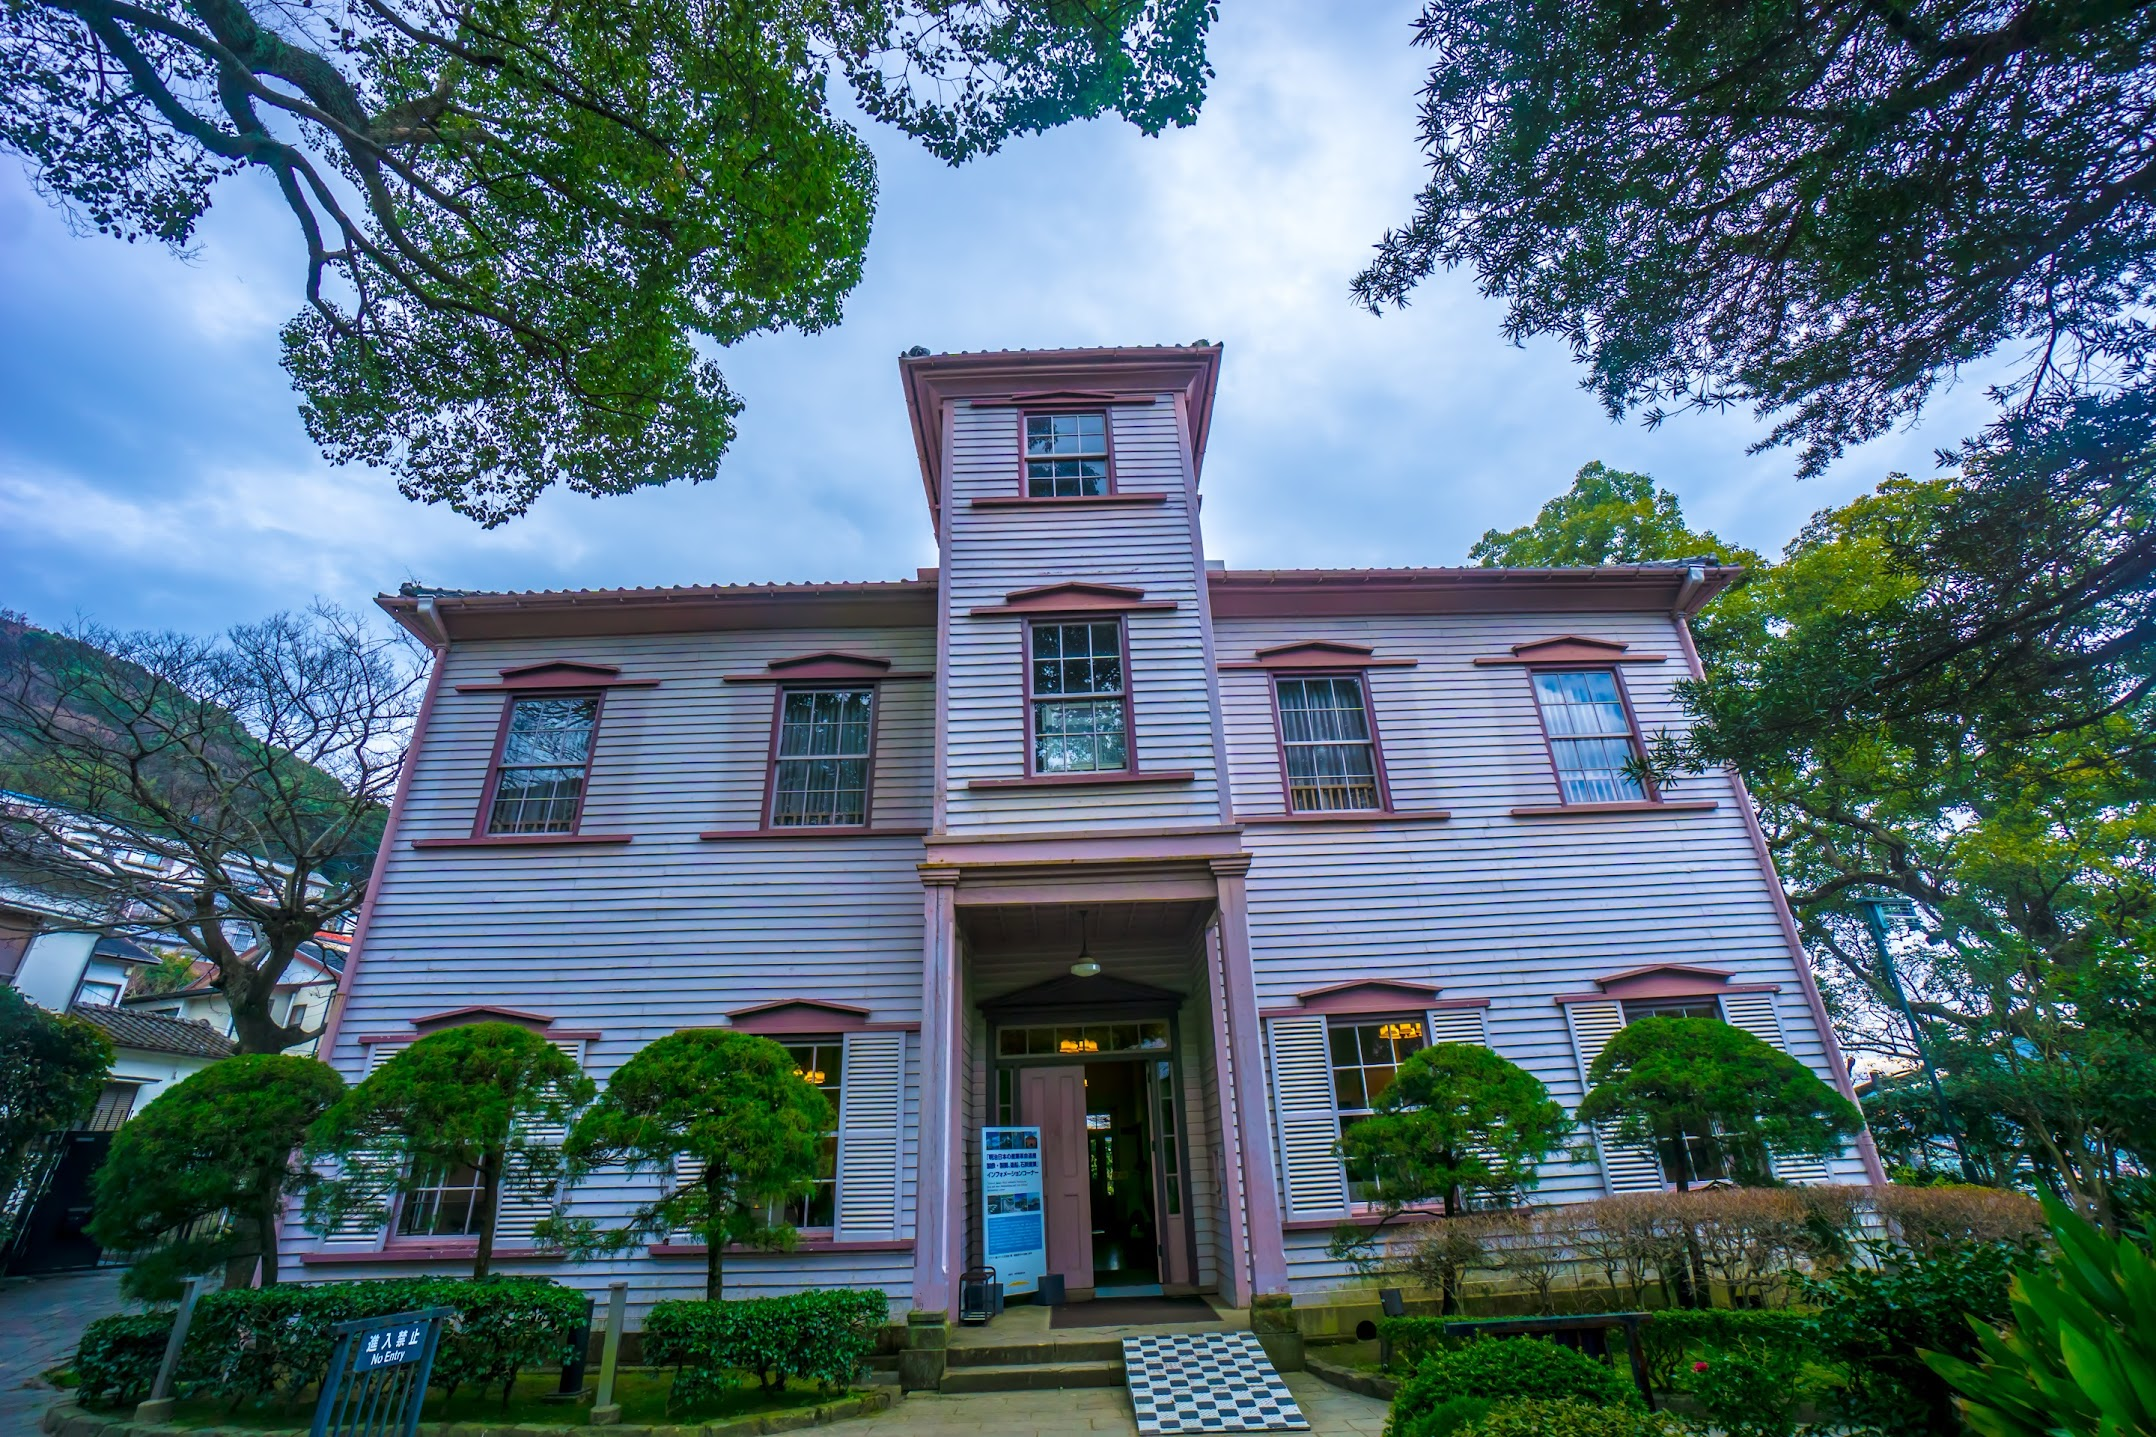 Nagasaki Glover Garden Former Steele Memorial Academy1